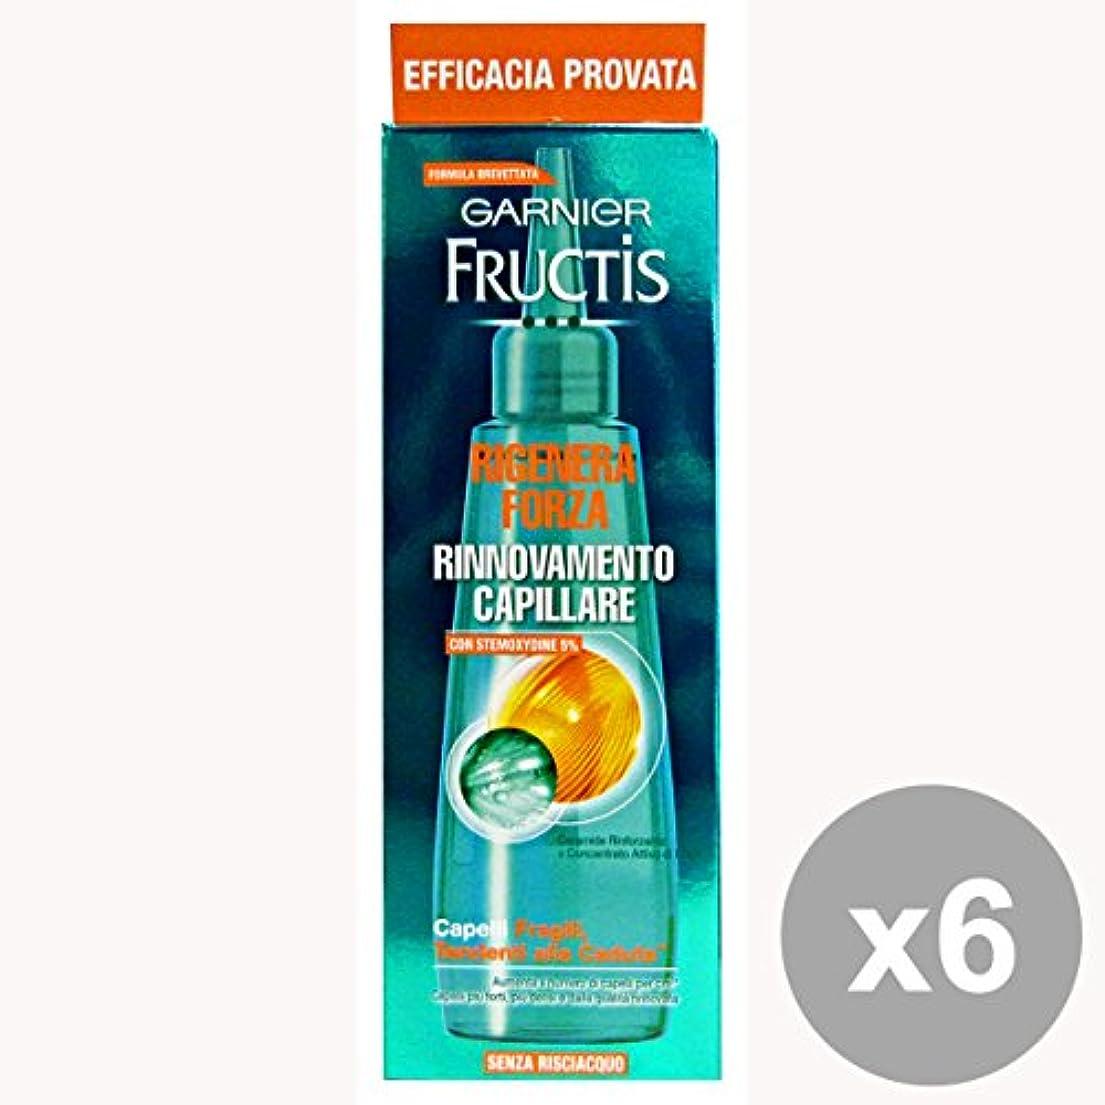 平野湿度GARNIER Set 6 Fructis Regenerieren Strength Lotion Erneuerungs Ohne Abspülen 84 Ml. Haar